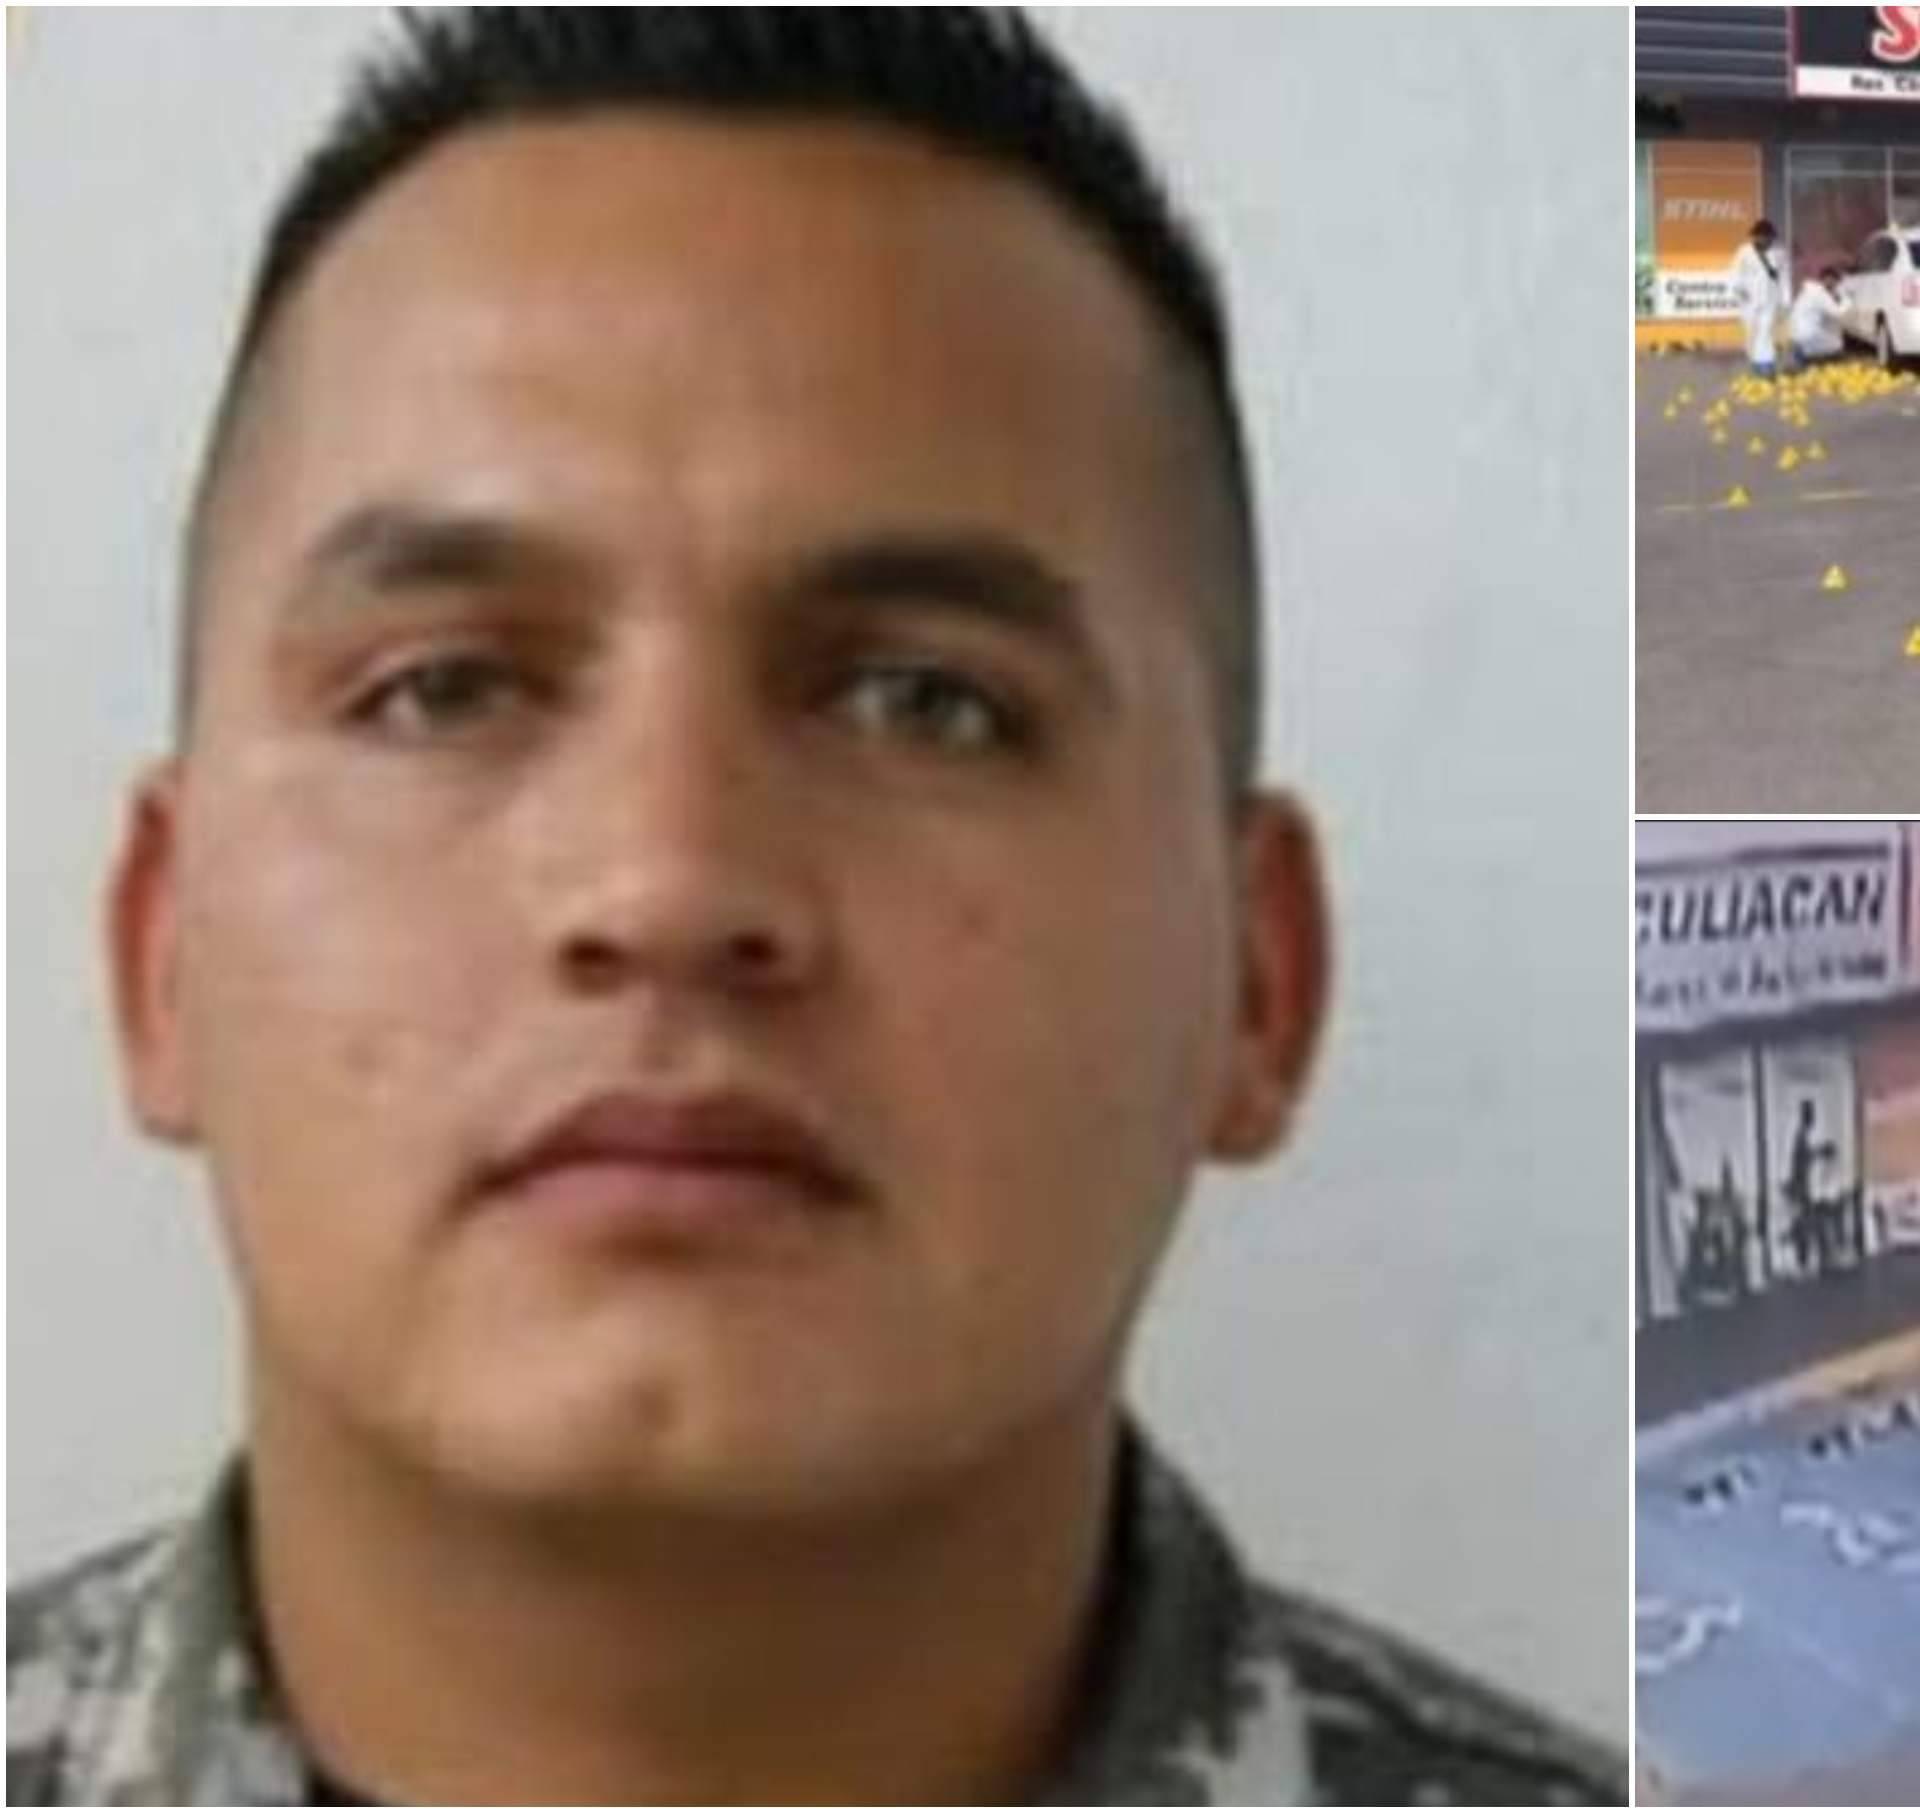 Propucan 150 puta:  Policajac nije ni uhitio El Chapovog sina